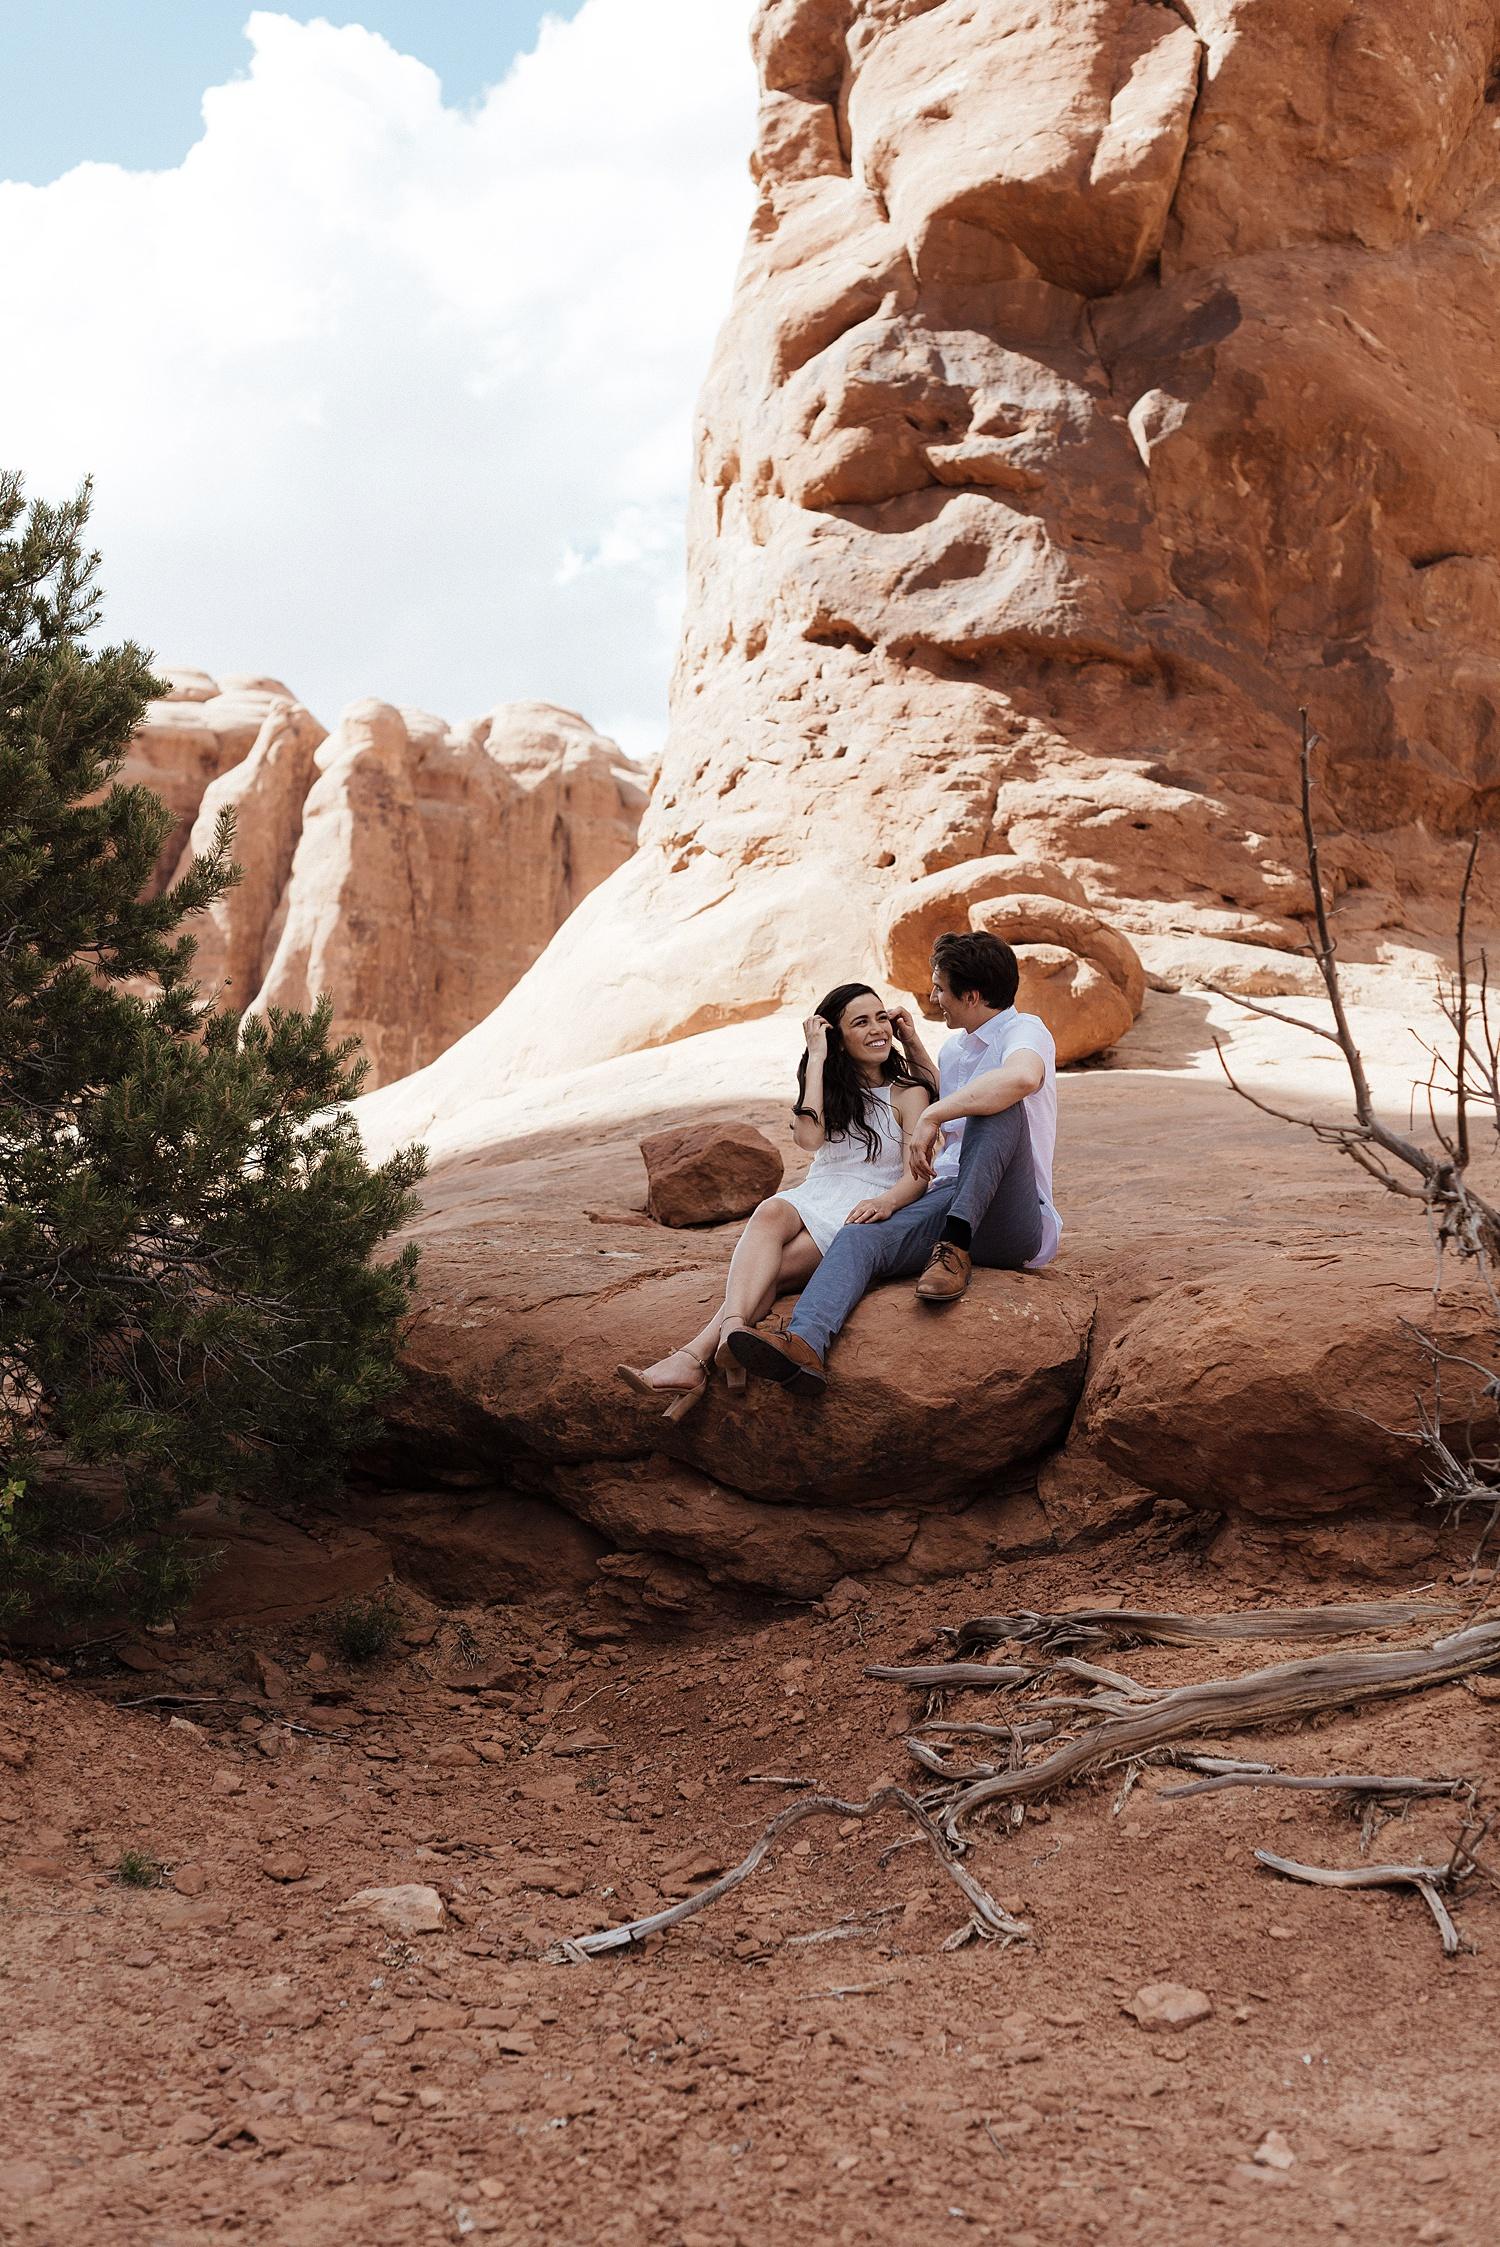 Zandra Barriga Photo - Dayana and Tom Arches National Park Engagements_0010.jpg